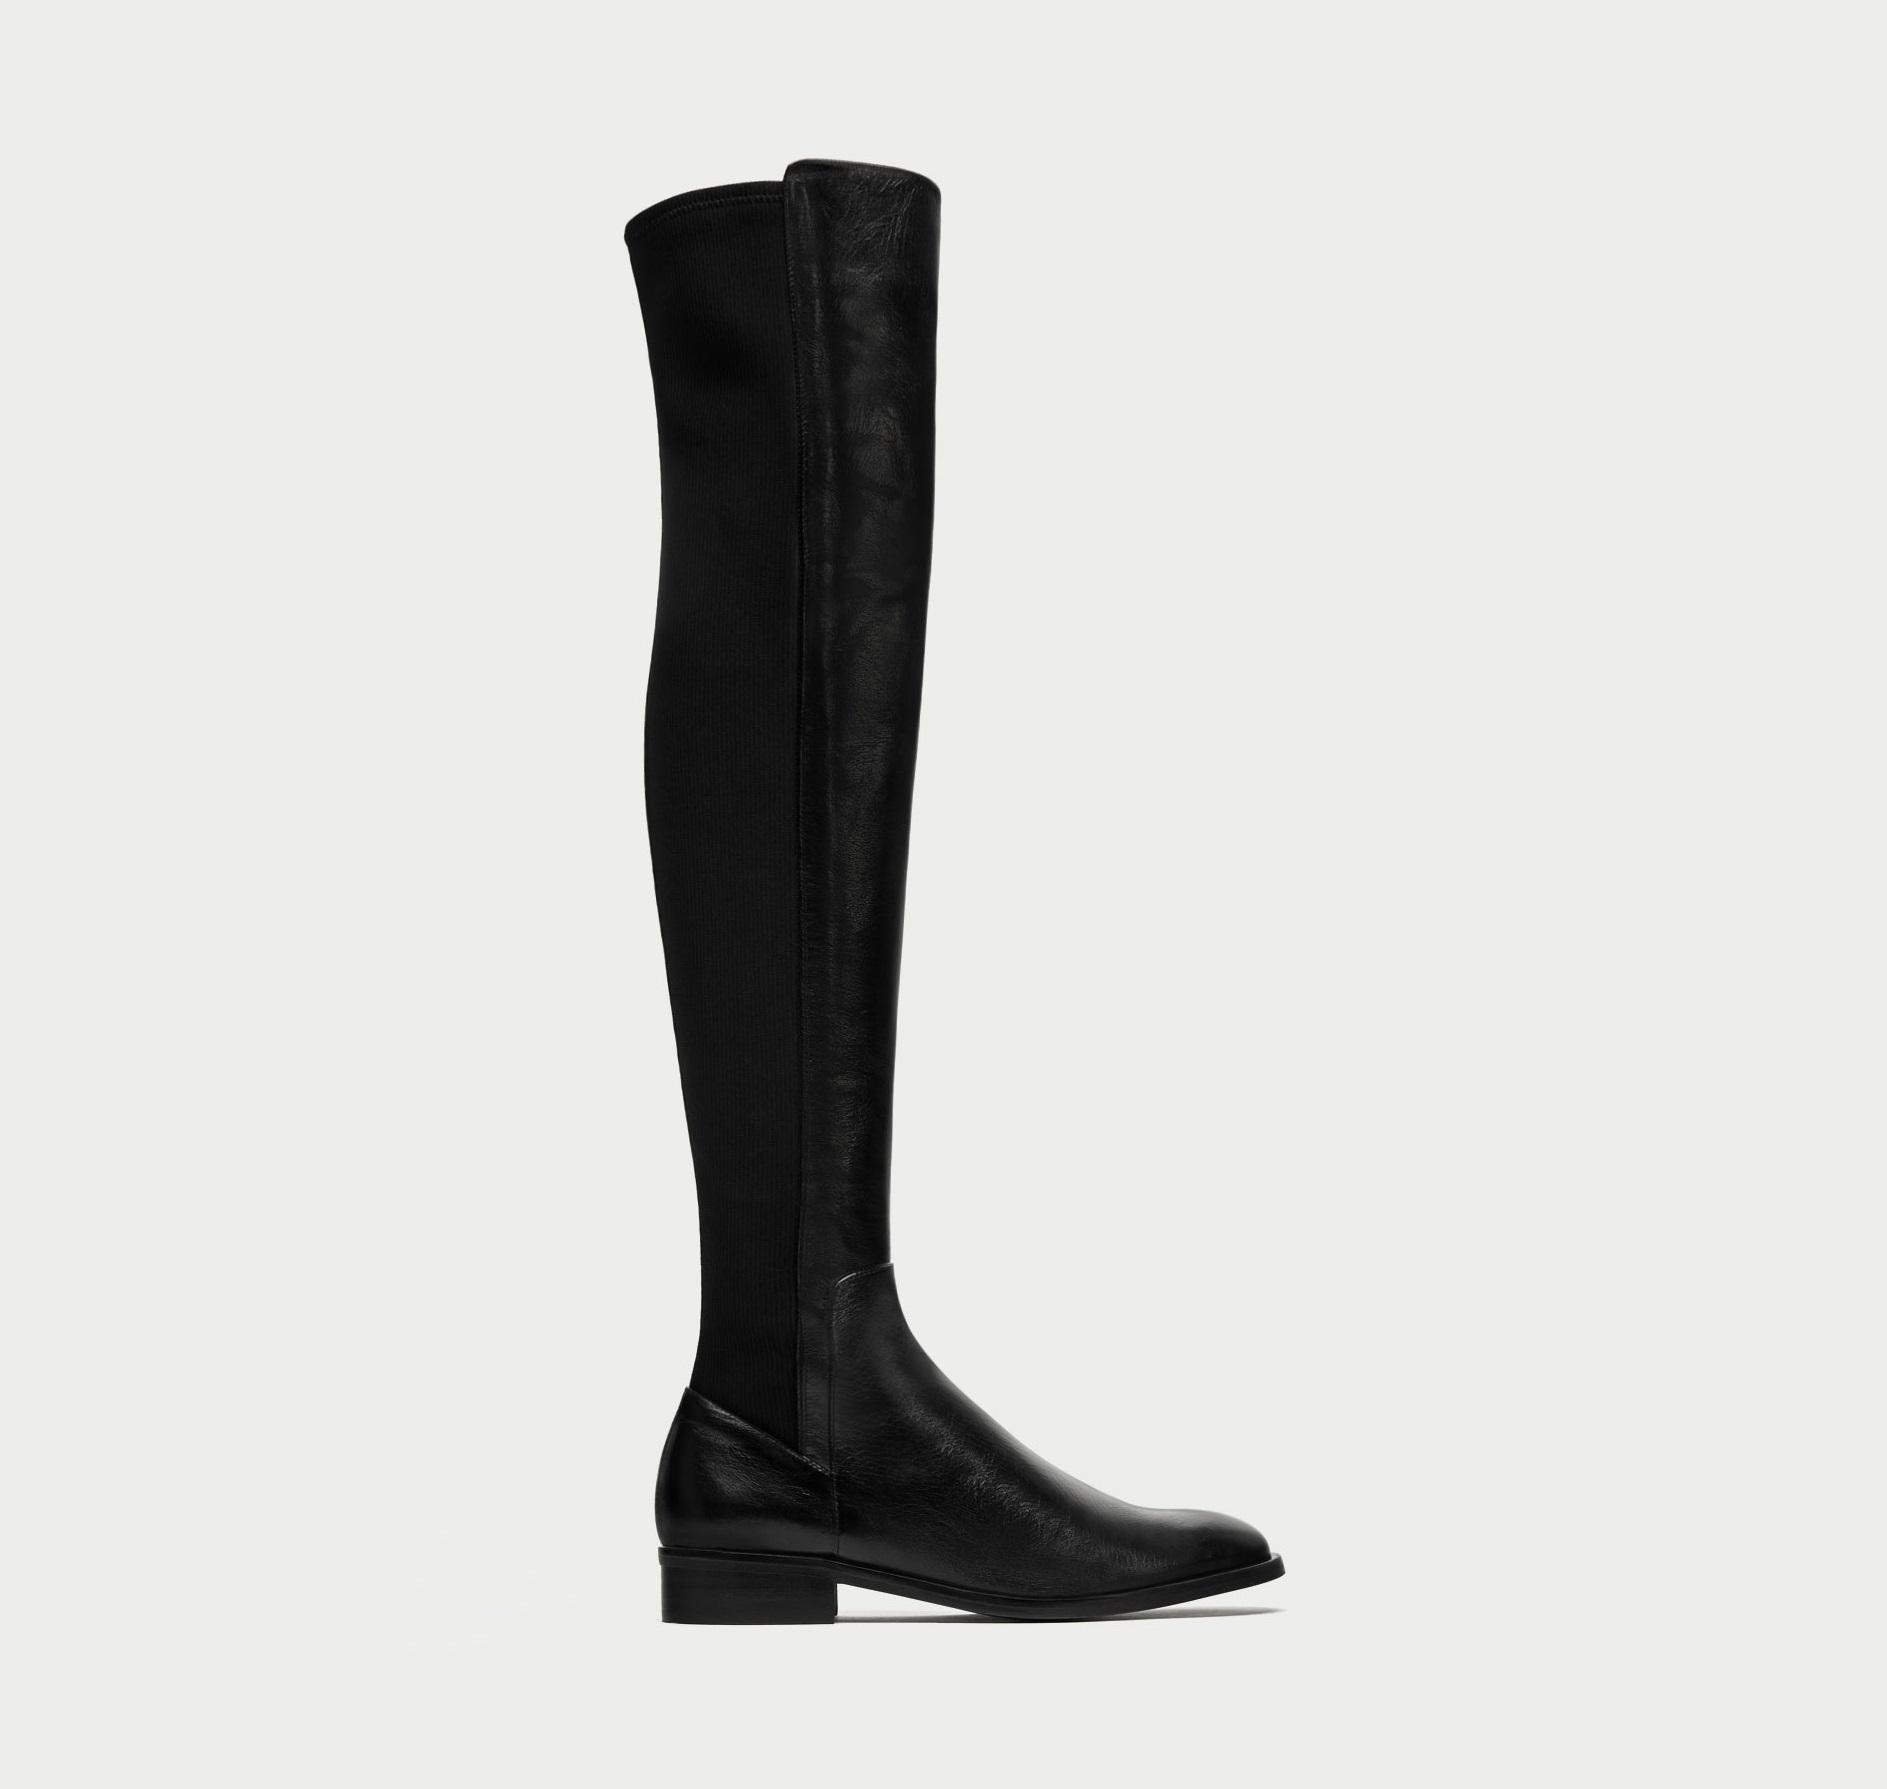 Stivali cuissard sopra il ginocchio Zara scarpe saldi invernali 2018